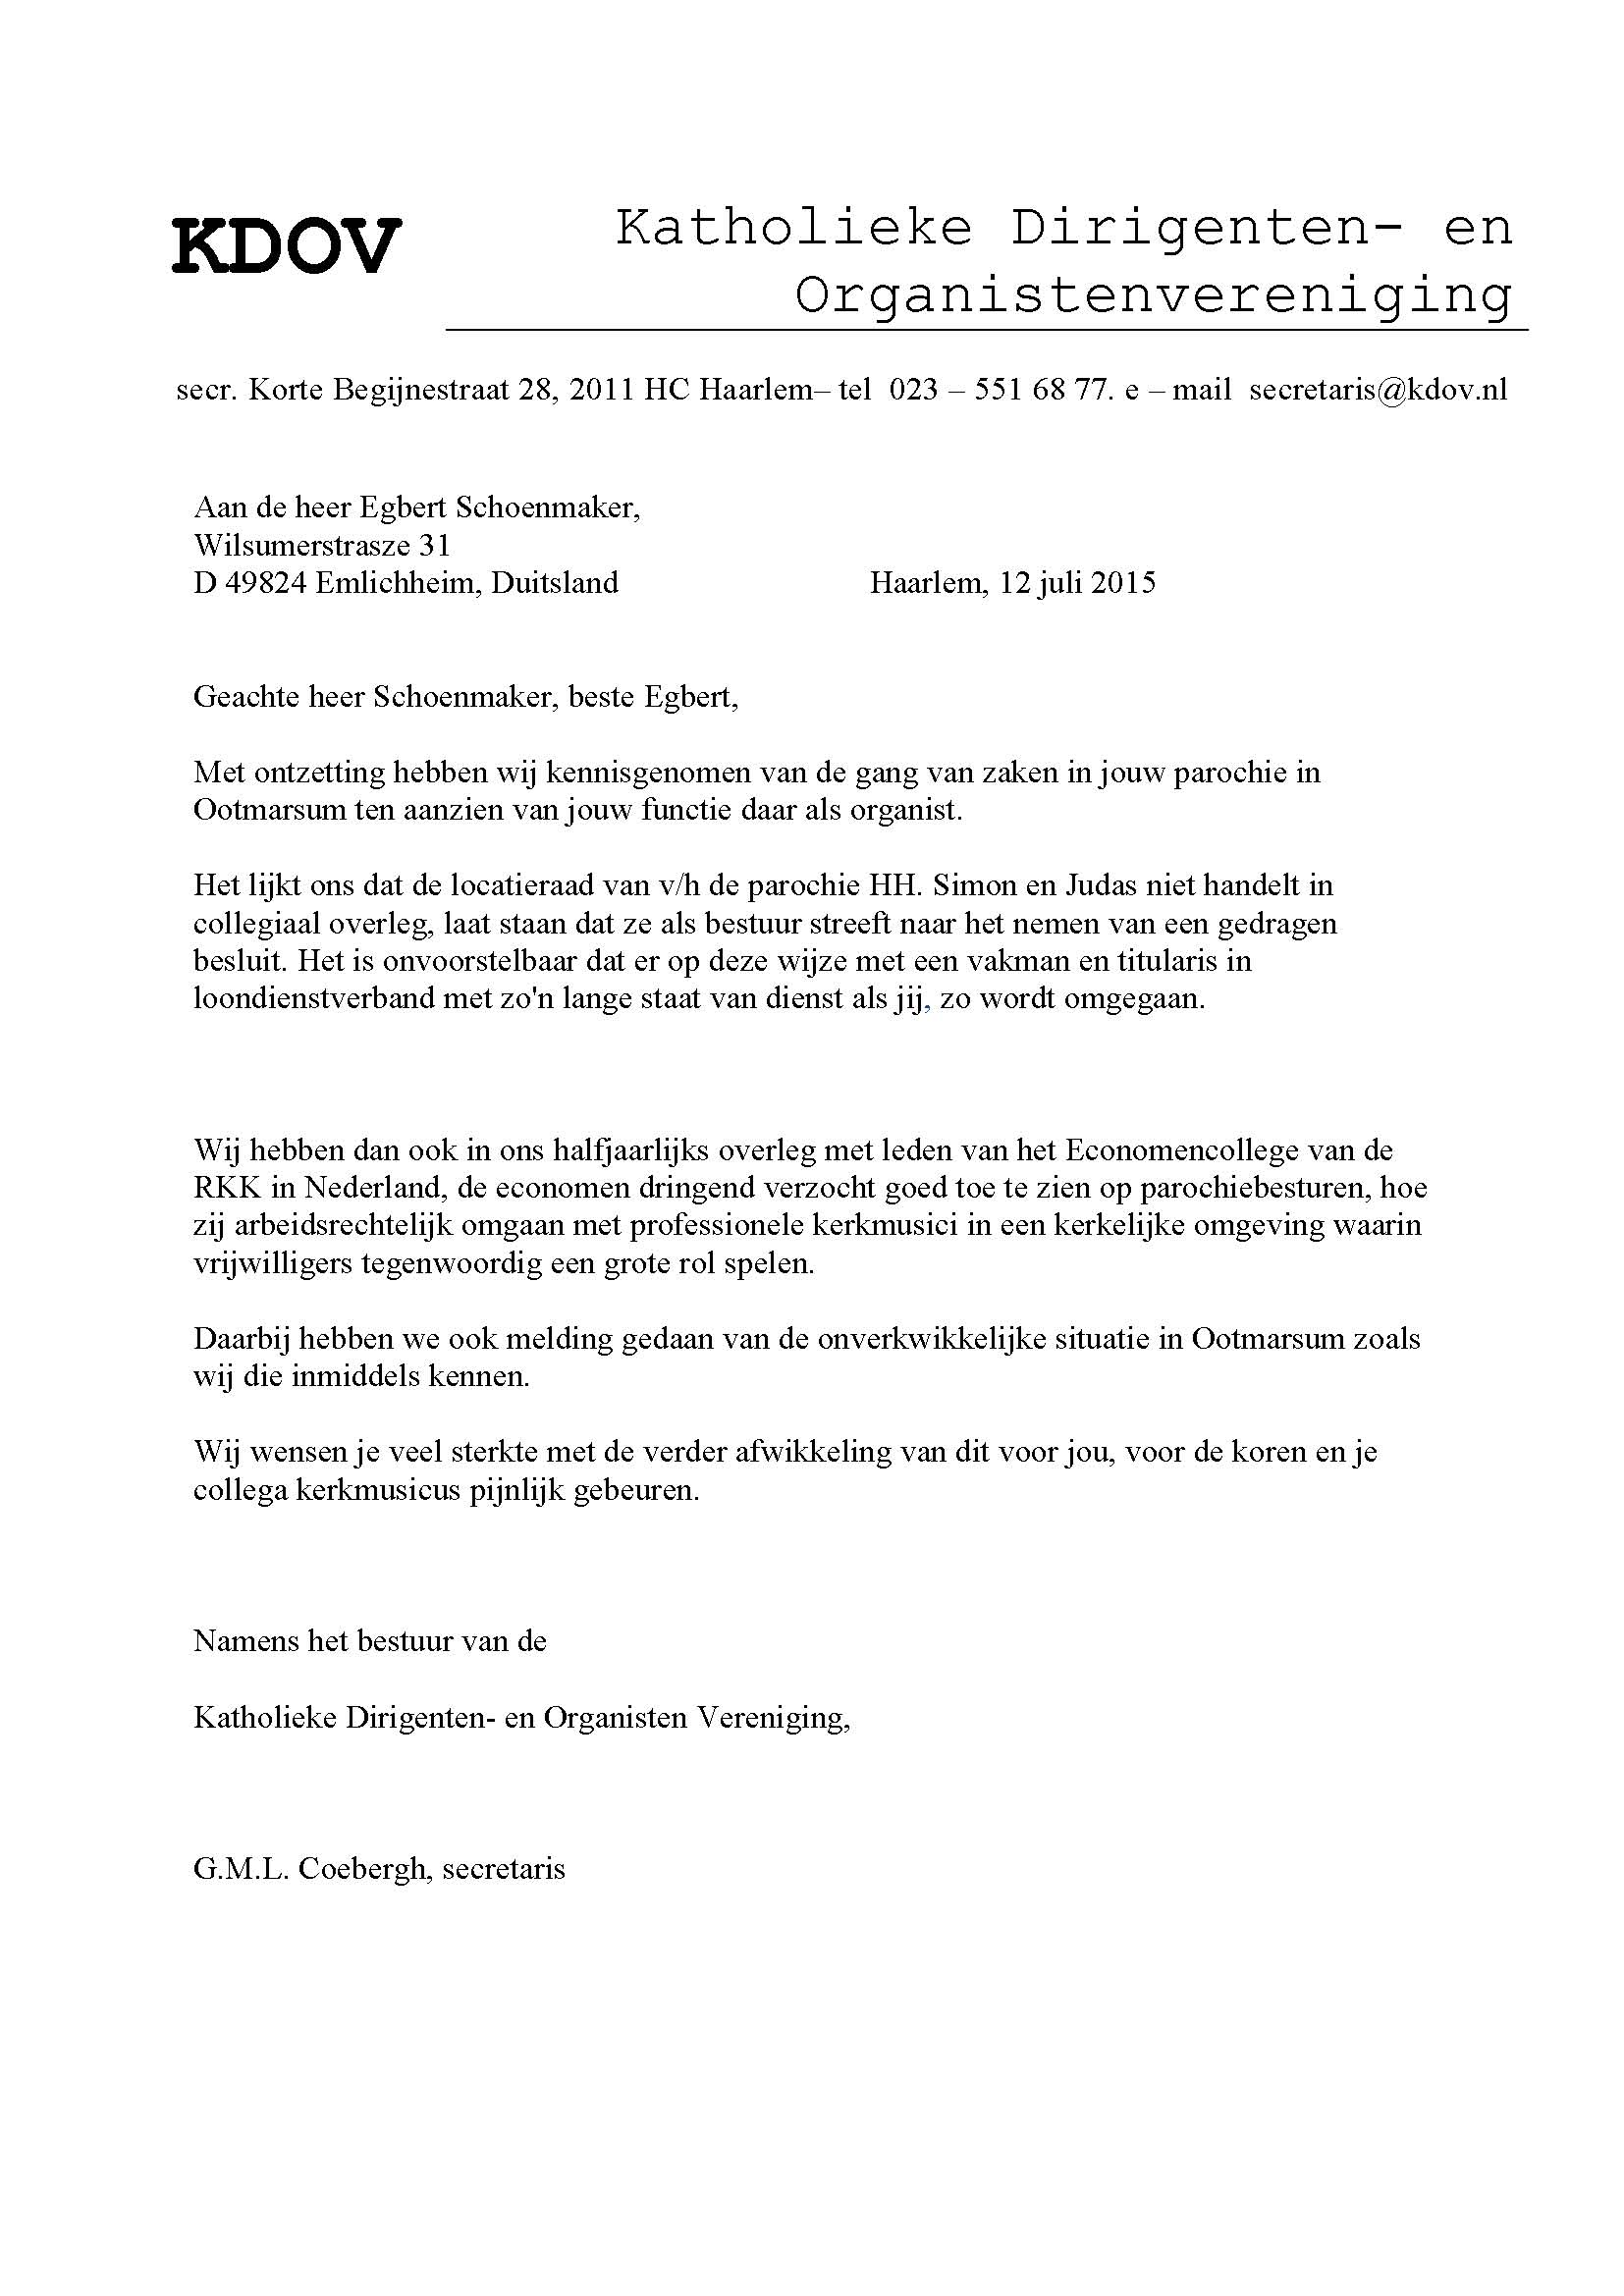 opstelling ontslagbrief Egbert Schoenmaker opstelling ontslagbrief